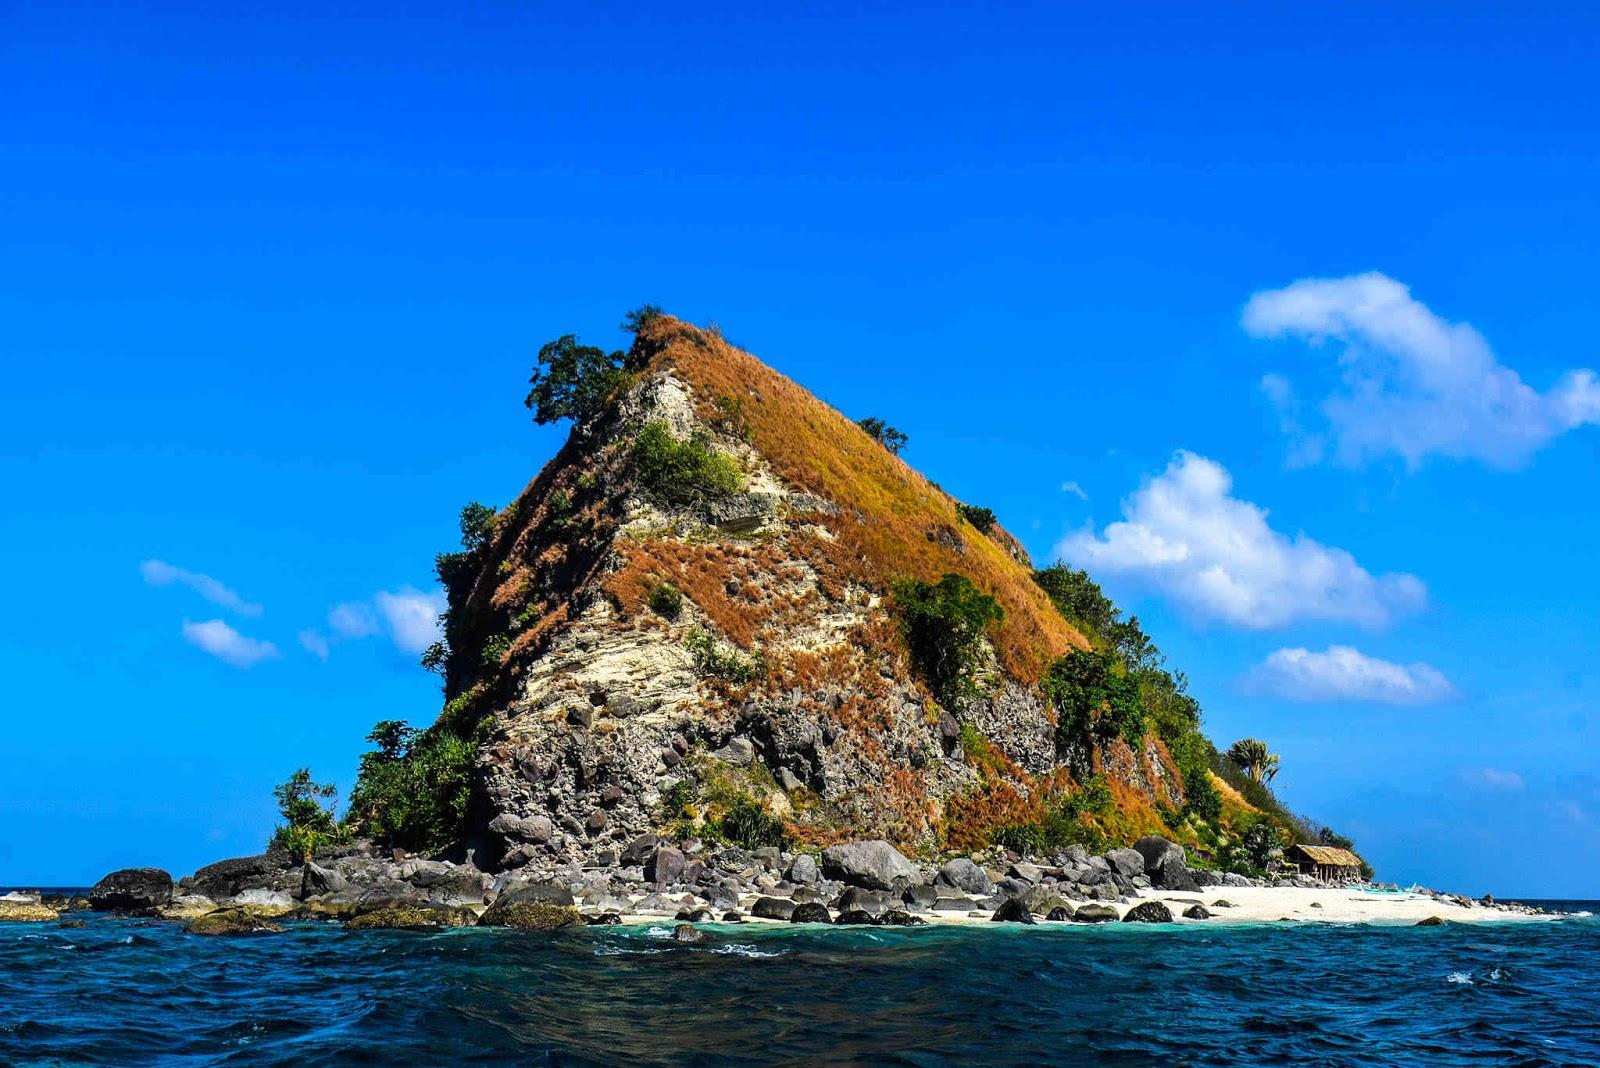 MUST-VISIT BEACHES NEAR MANILA according to Pinoy Travel